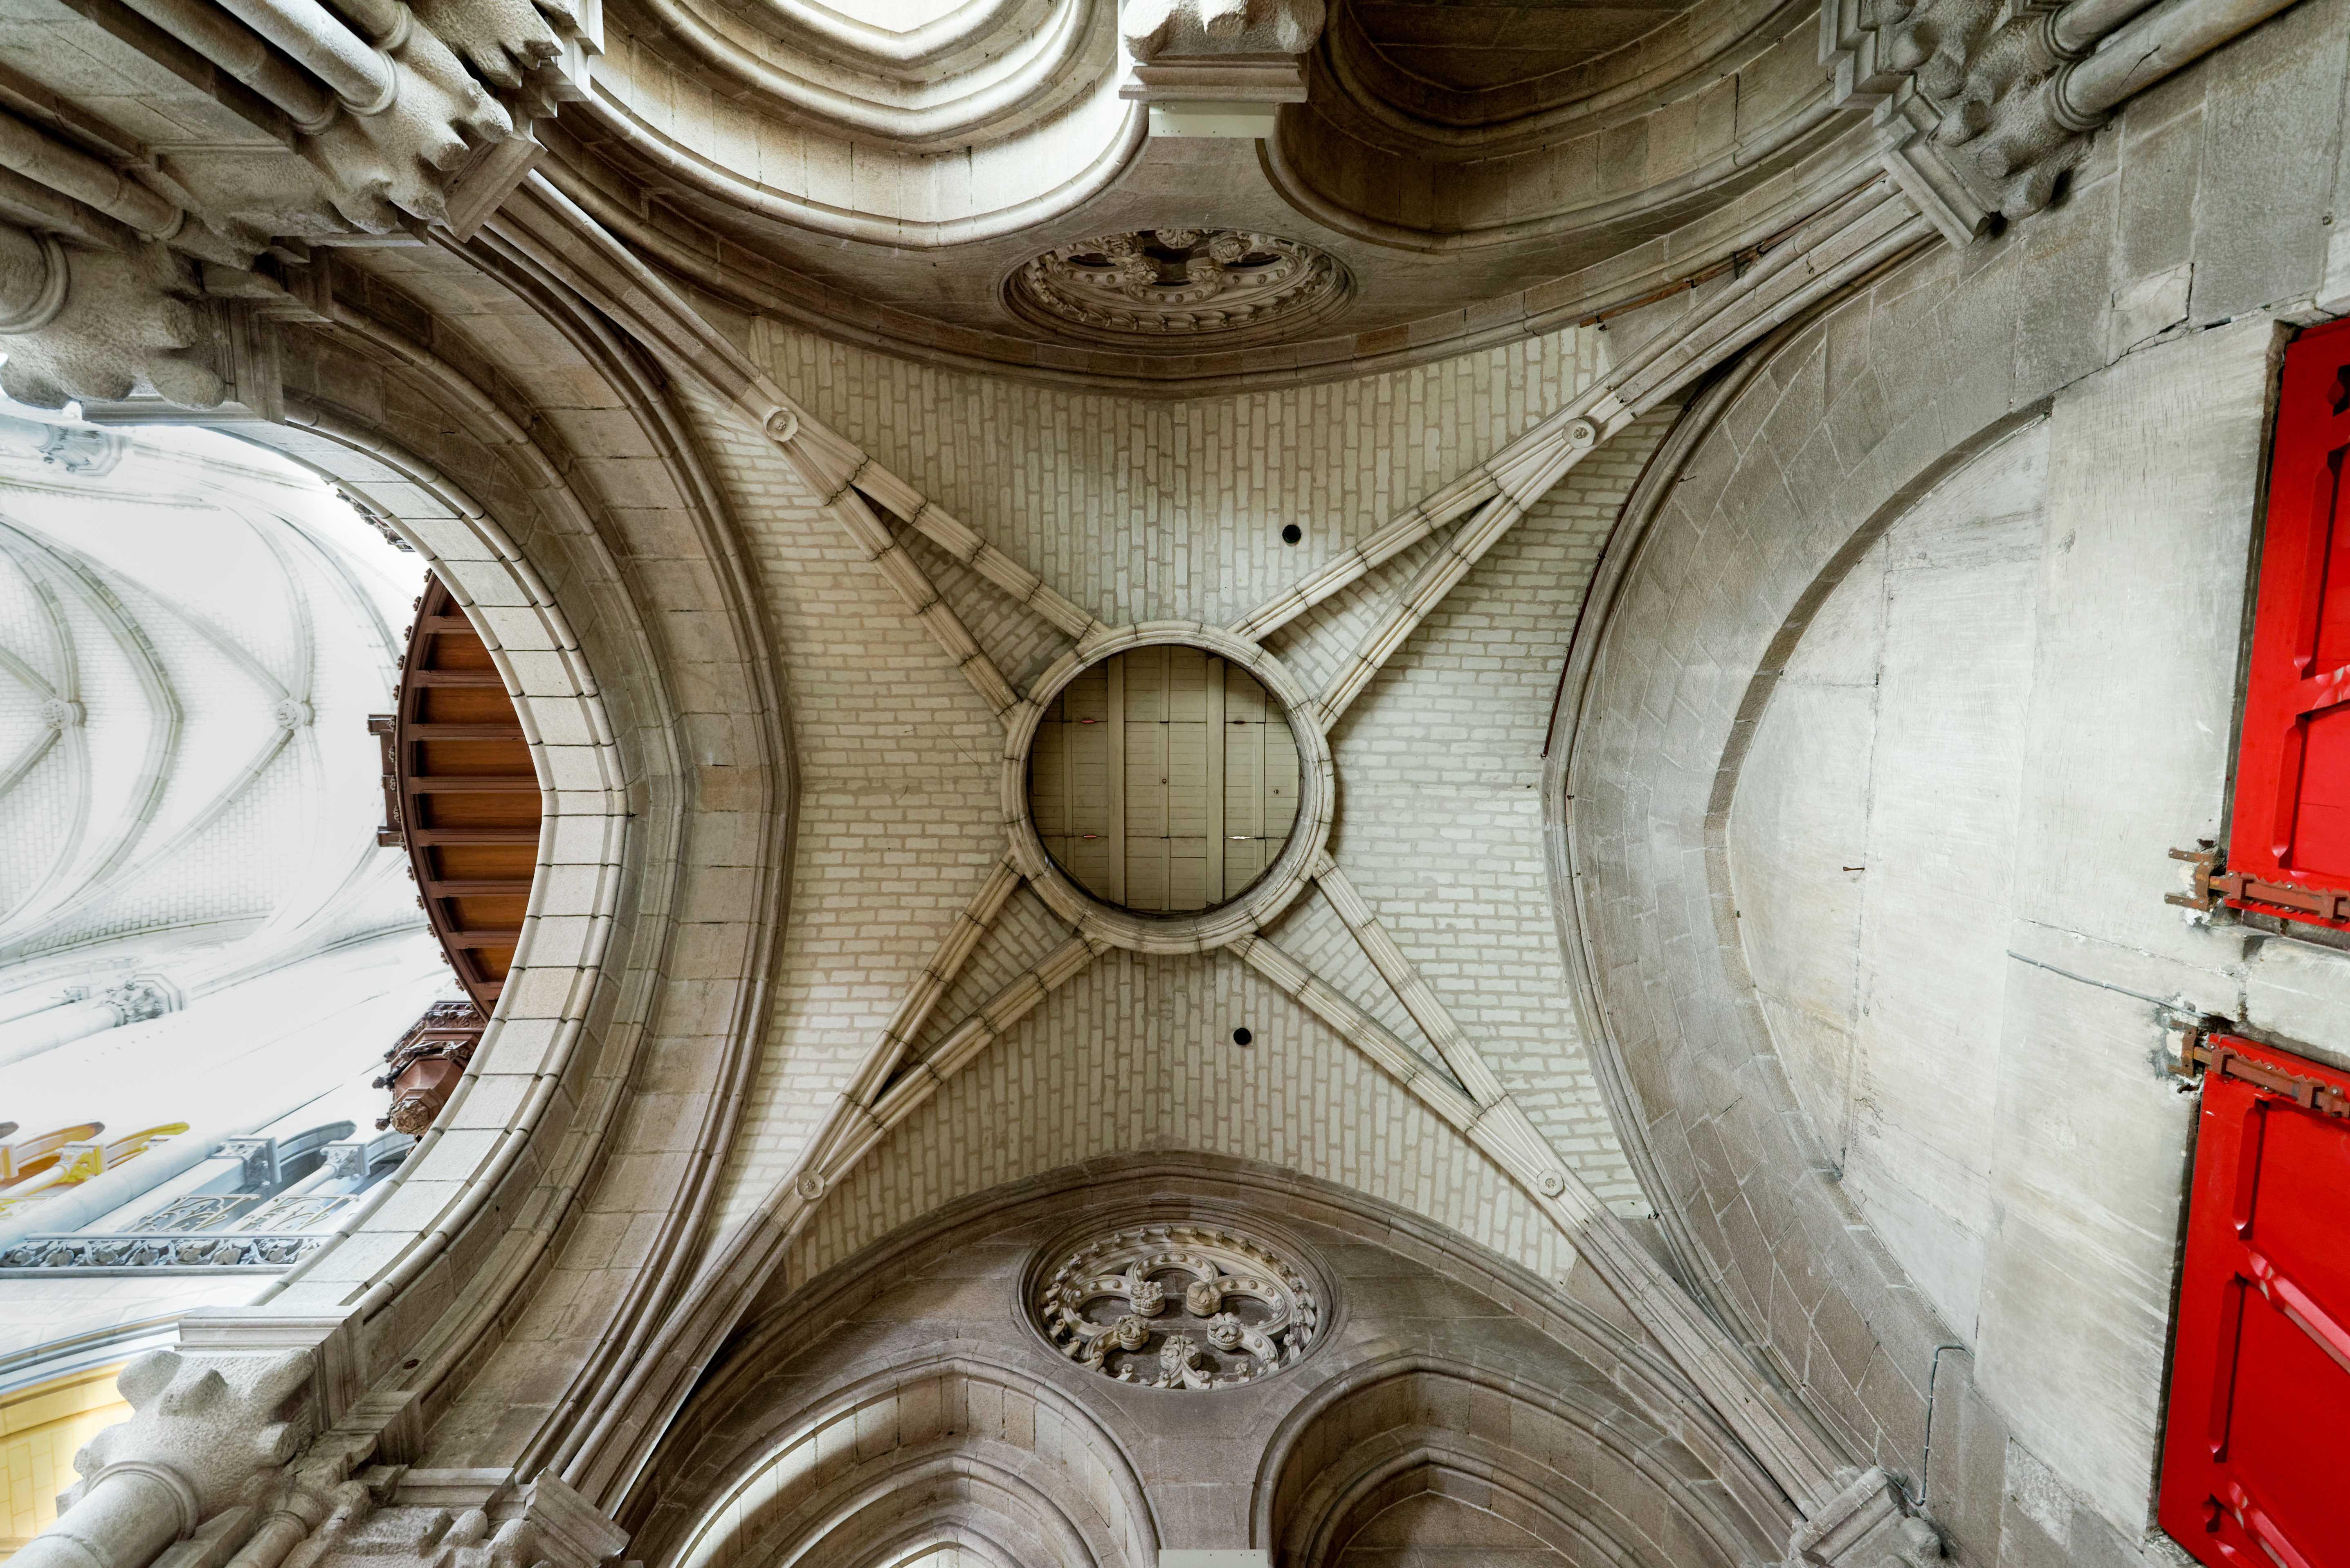 François de Dijon [CC BY-SA (https://creativecommons.org/licenses/by-sa/4.0)]